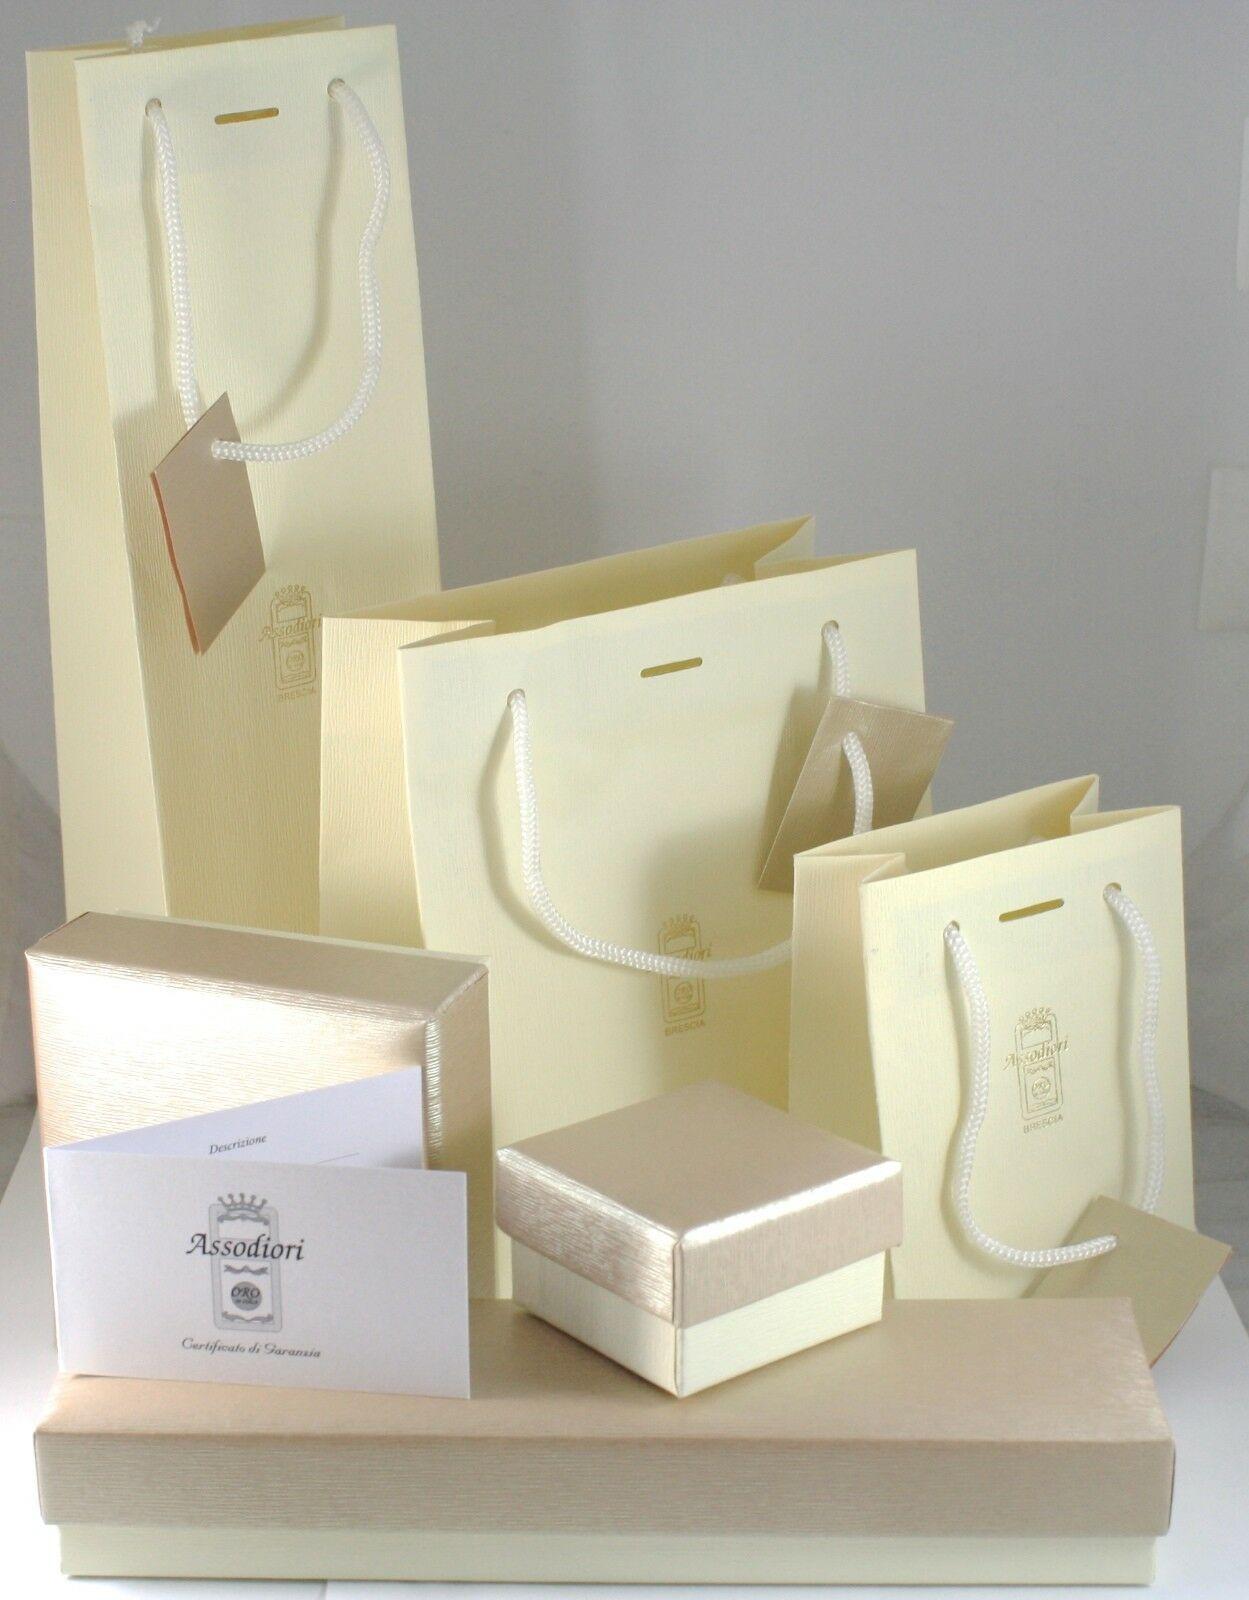 Necklace White Gold 750 - 18K, Trilogy Aquamarine Oval Carat 2.50 & Diamond